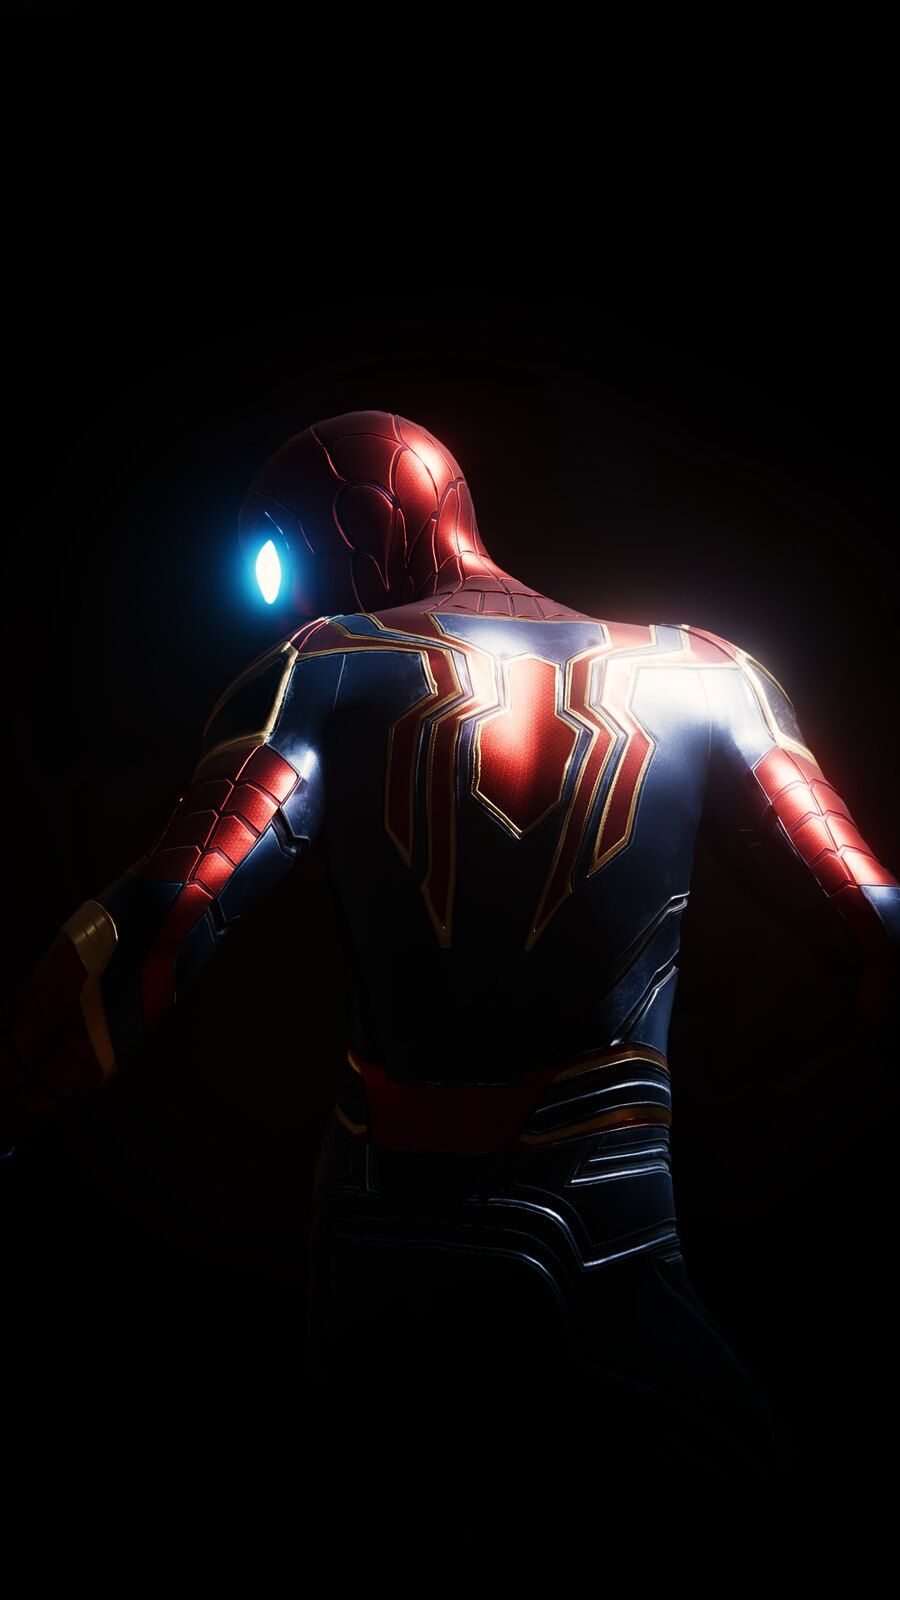 Spiderman Iphone Wallpaper Spidermanmcu Spiderman Iron Spider Amazing Spiderman Iron spider spider man dark wallpaper